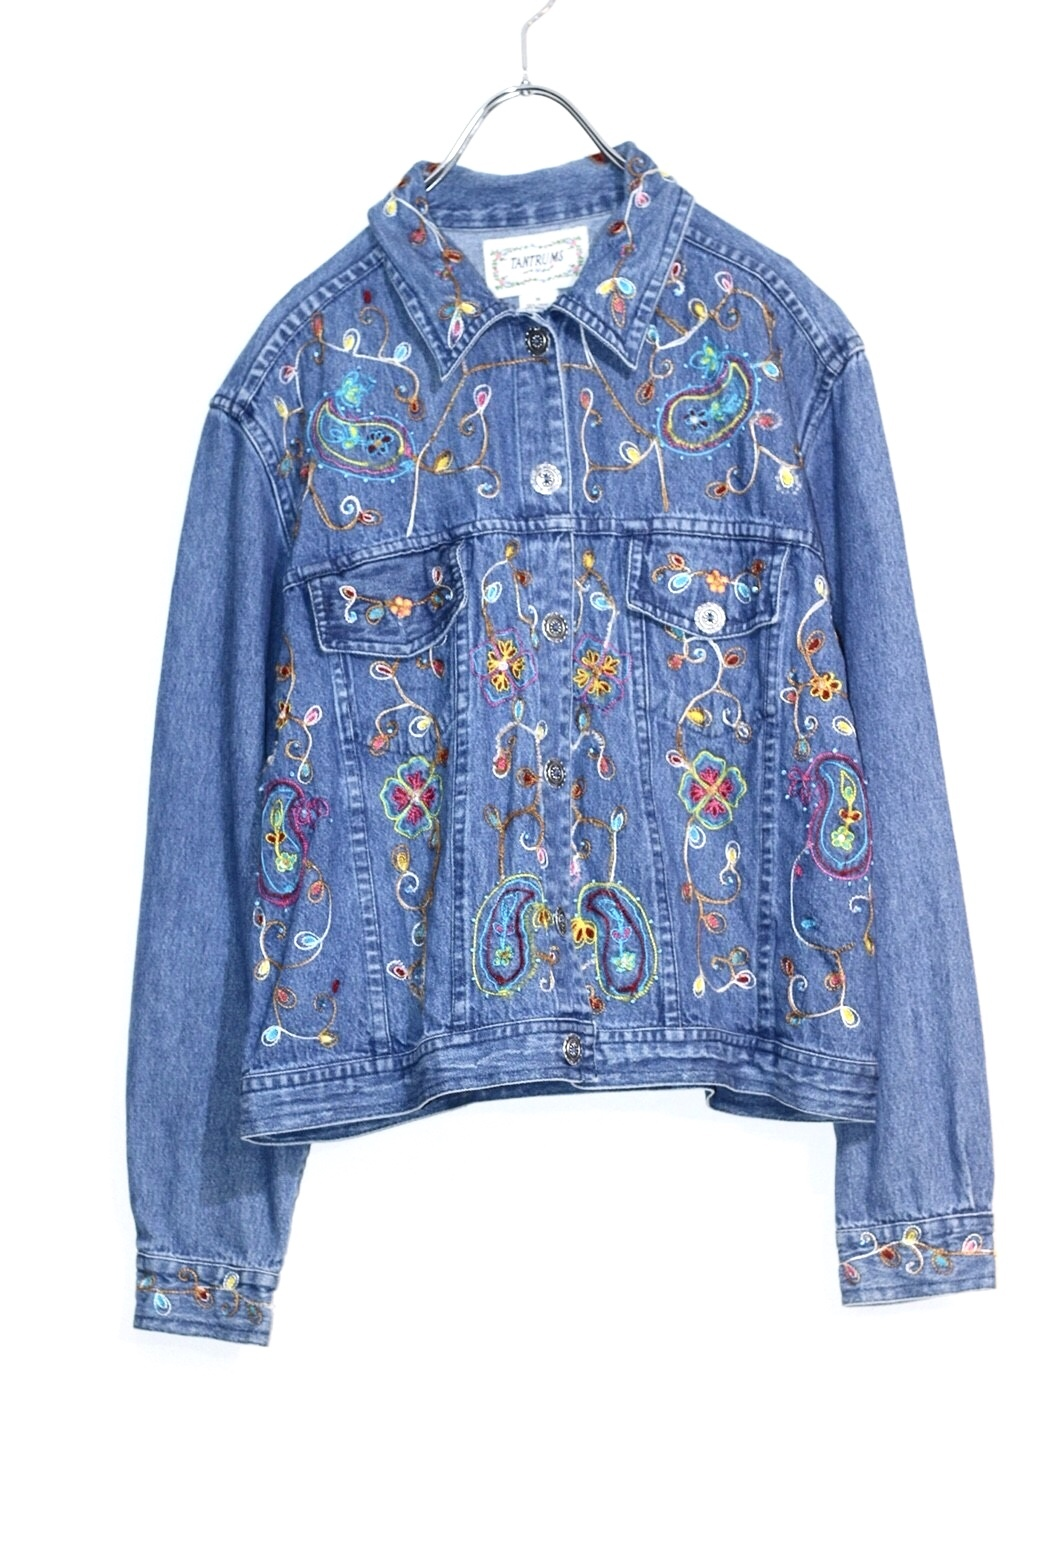 刺繍 denim jacket